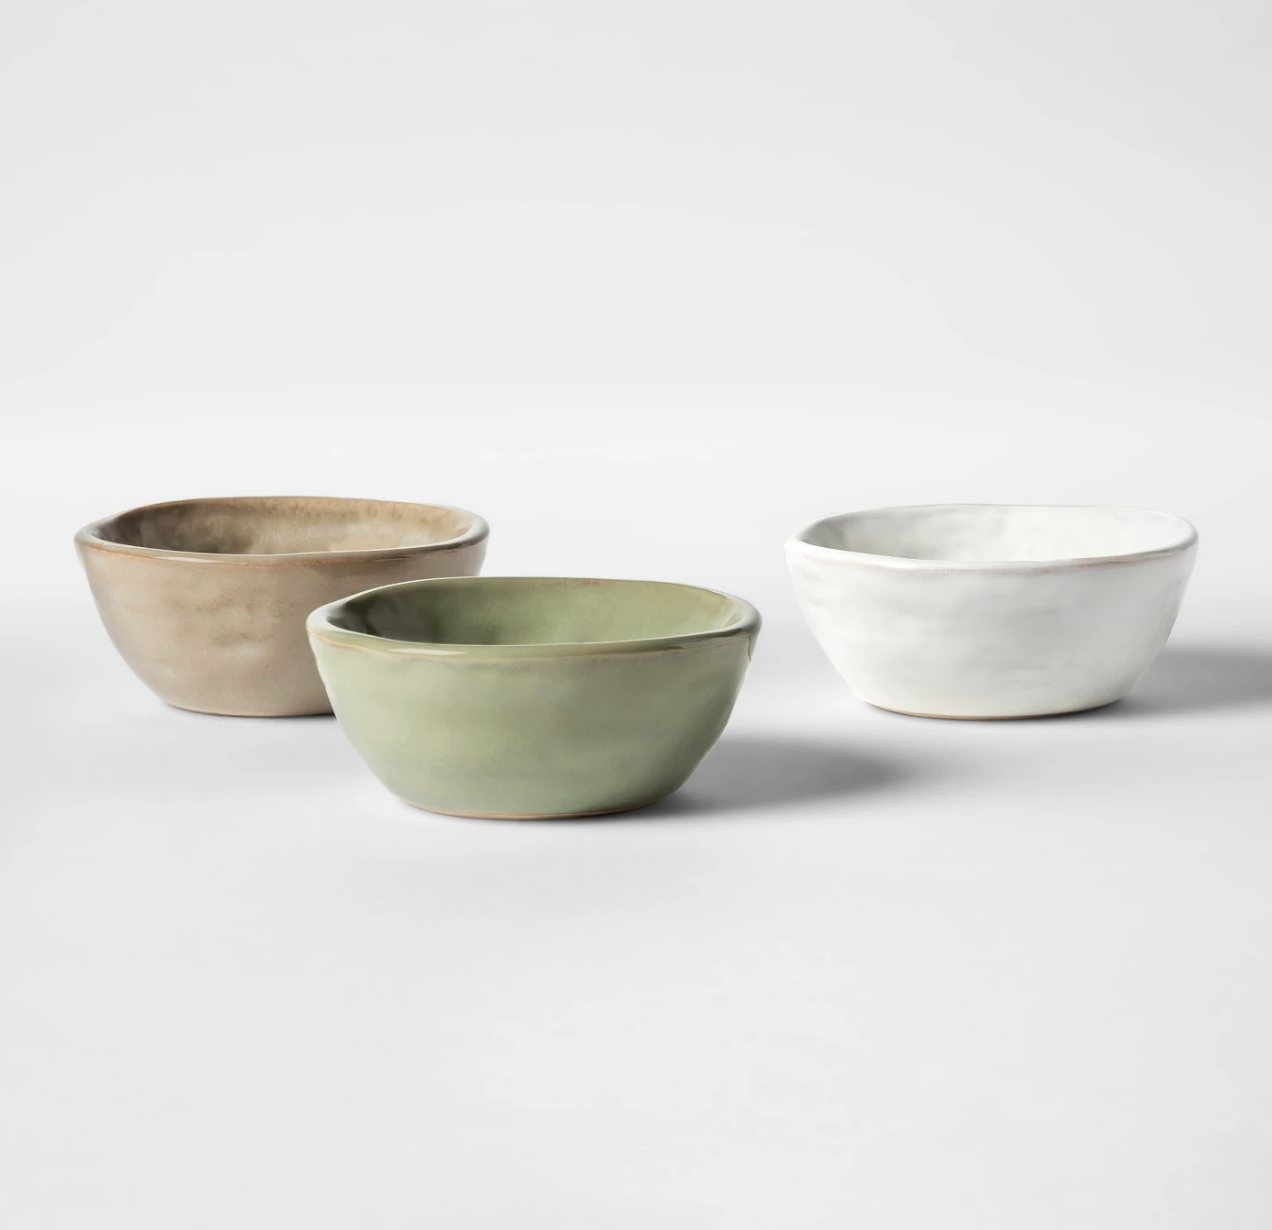 Cravings by Chrissy Teigen 3pk 3_ Pinch Bowls